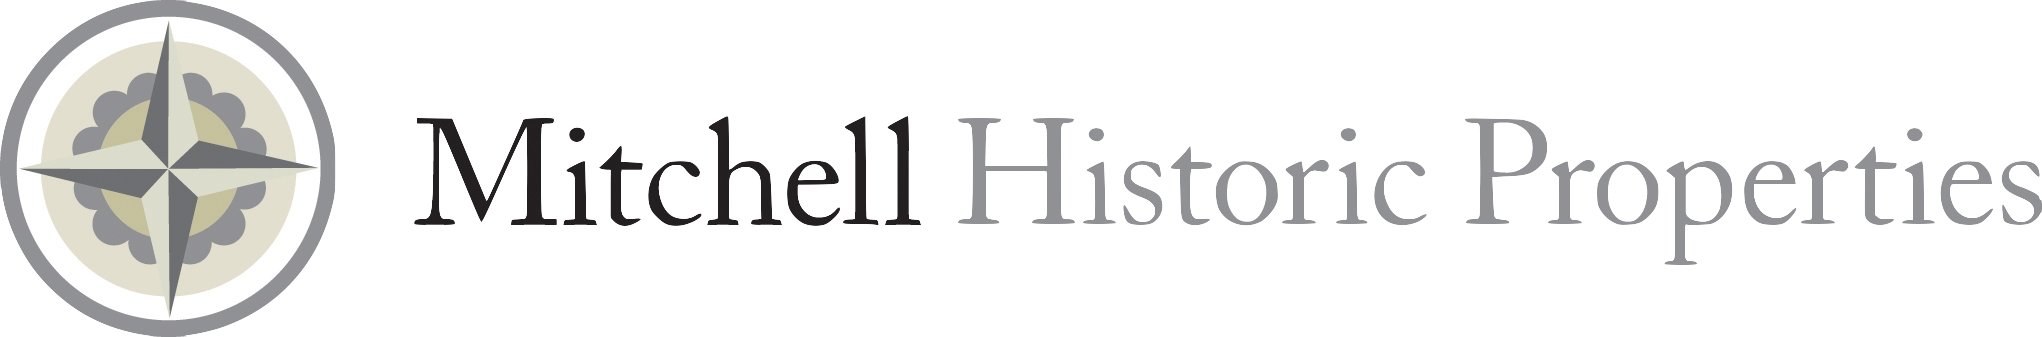 Mitchell Historic Properties